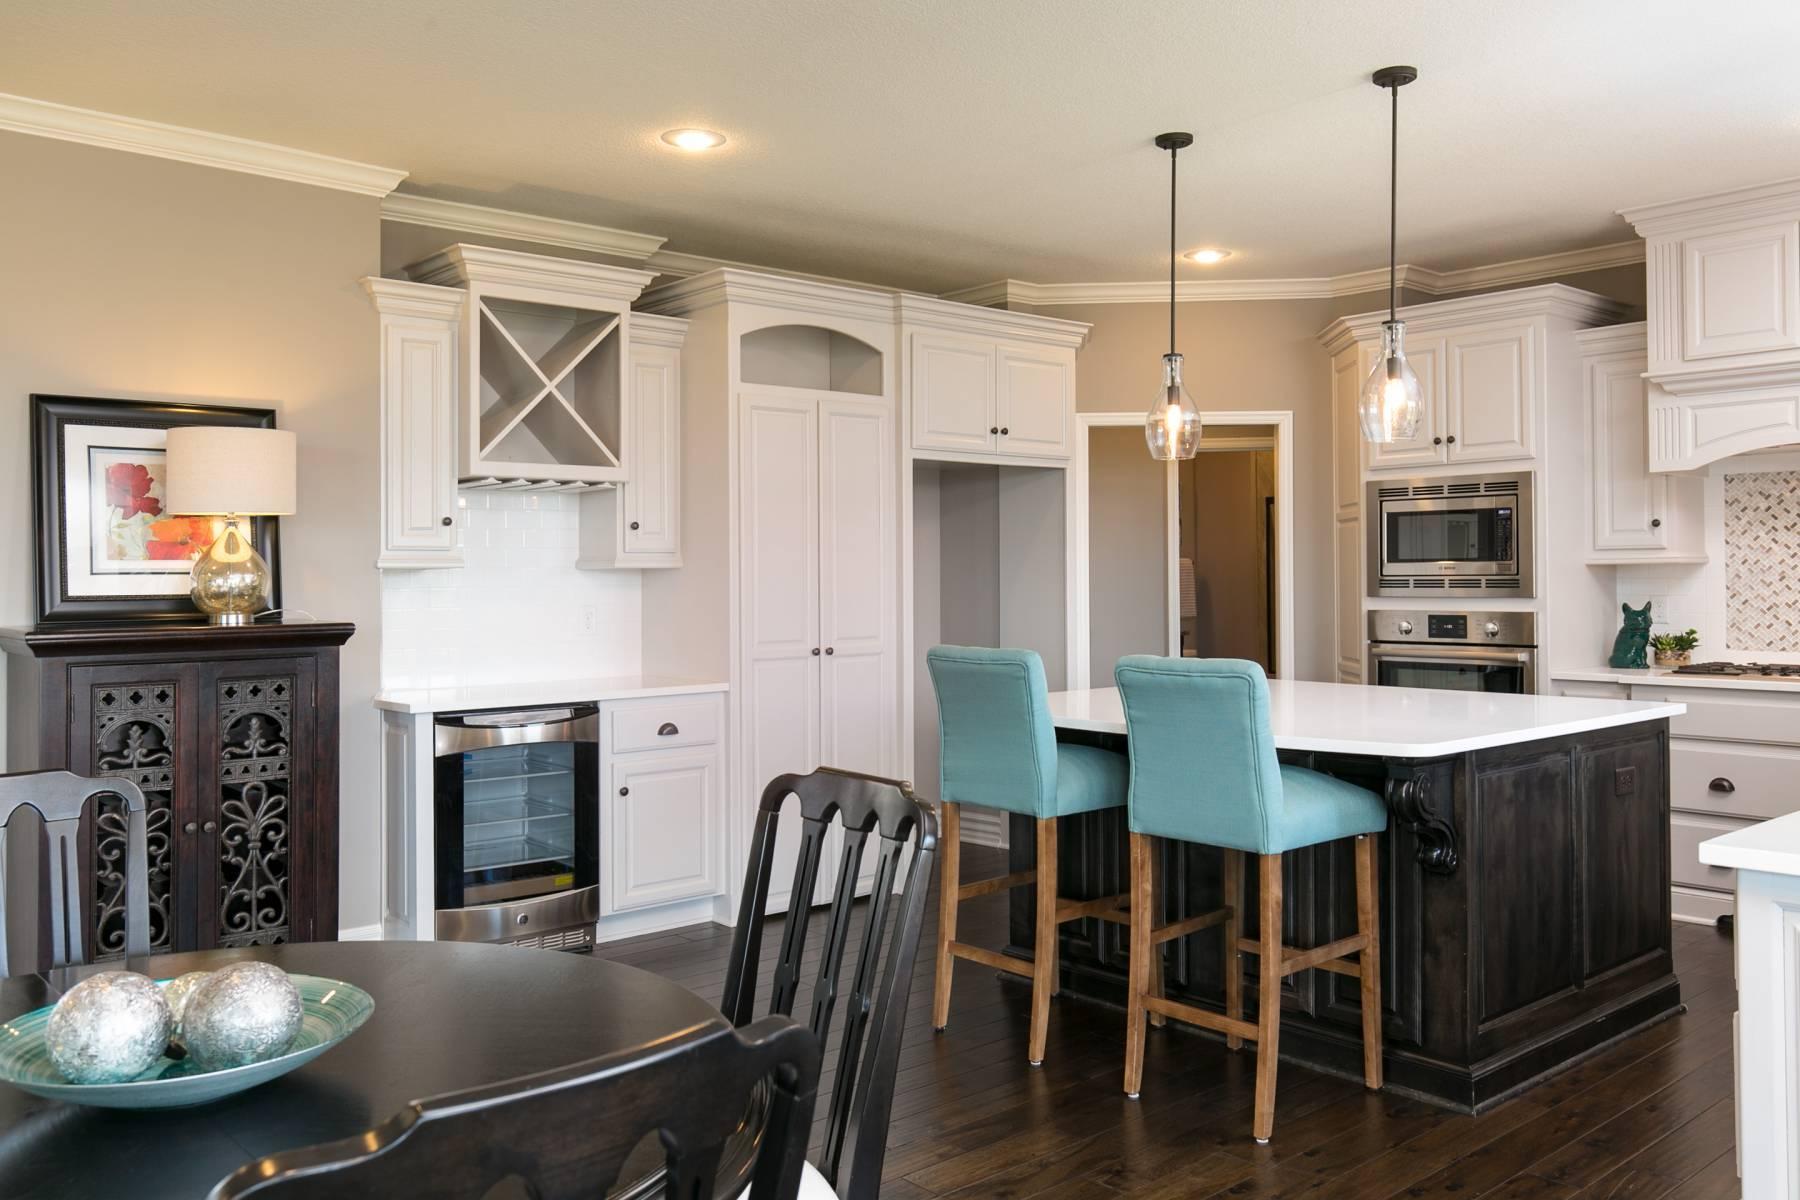 Kitchen featured in the Bristol Ridge By Summit Homes in Kansas City, MO